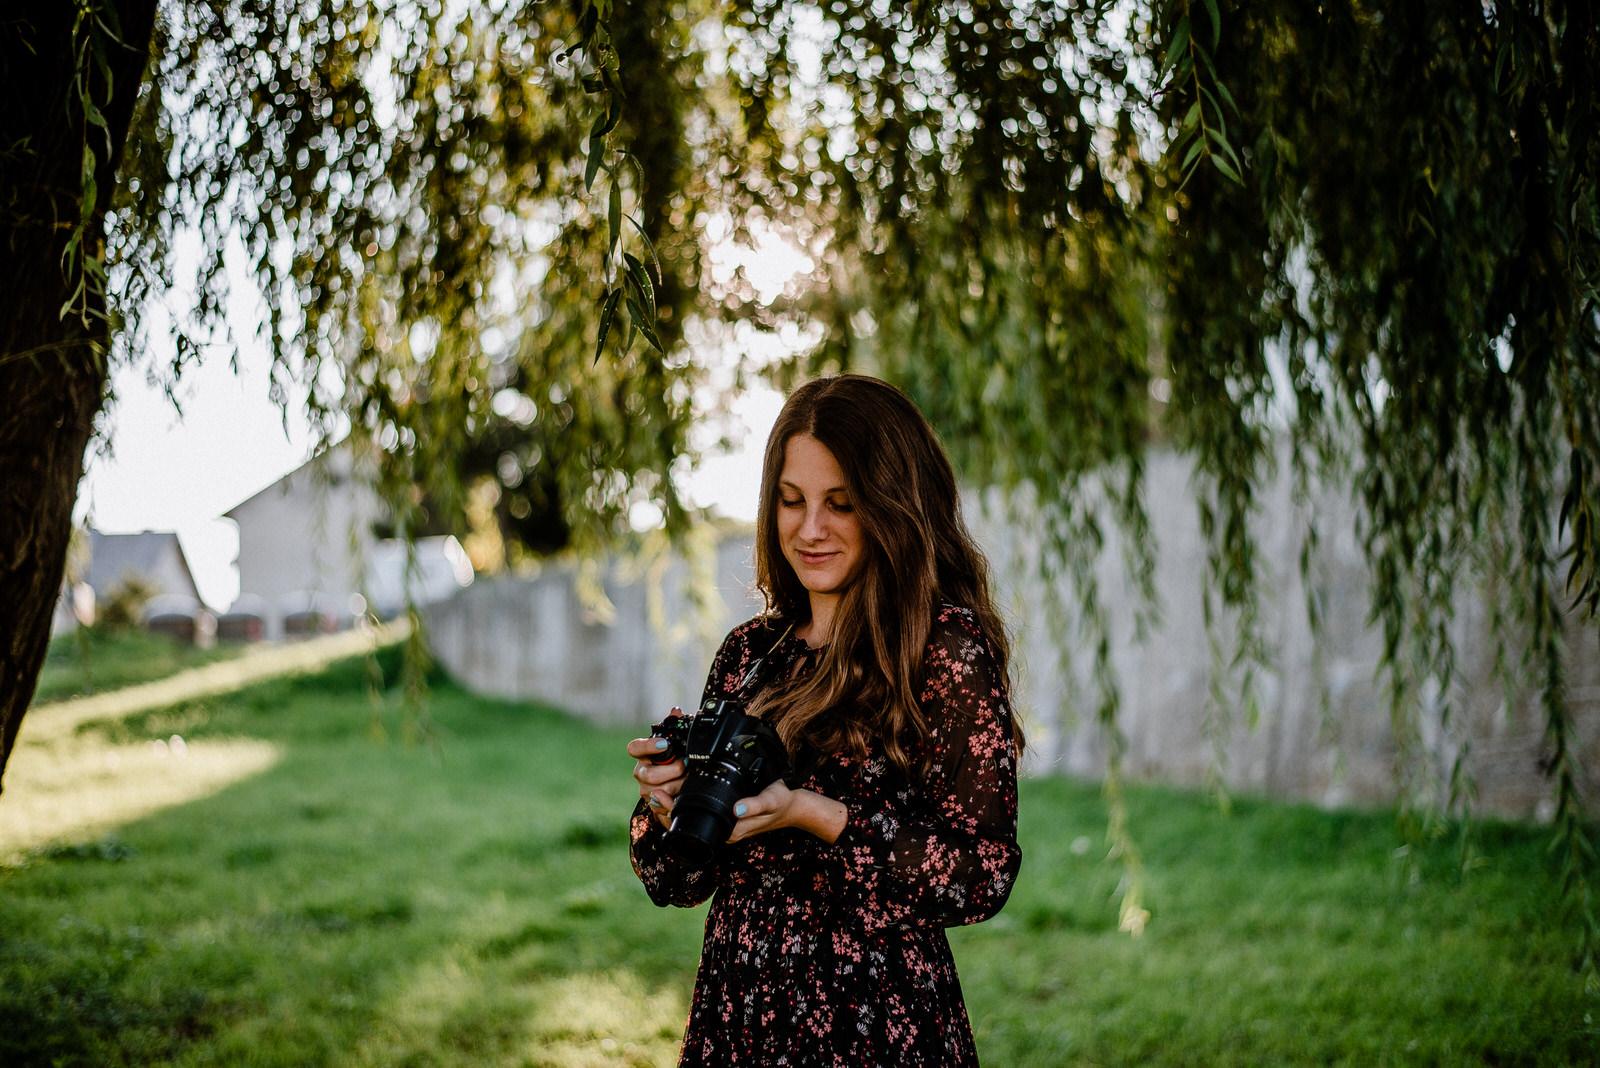 likaclub_intervju-tomislava-i-marija-maras_gospić_2019-2